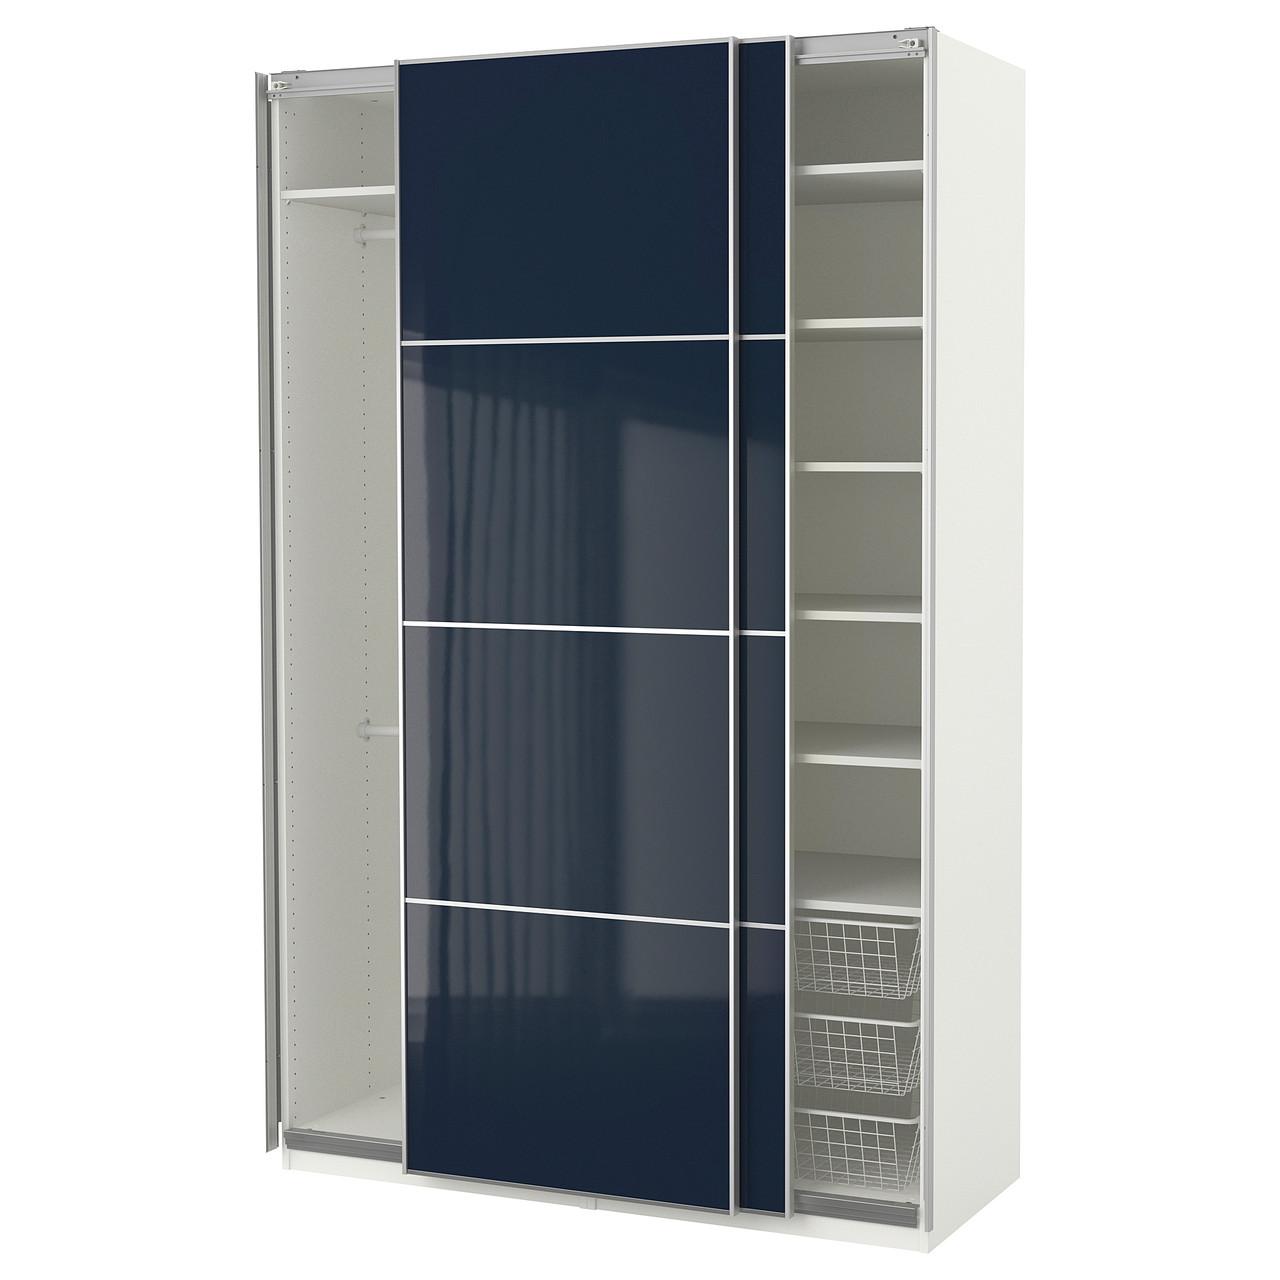 "ИКЕА ""ПАКС"", Гардероб, белый, с синим оттенком, 150x66x236 см"